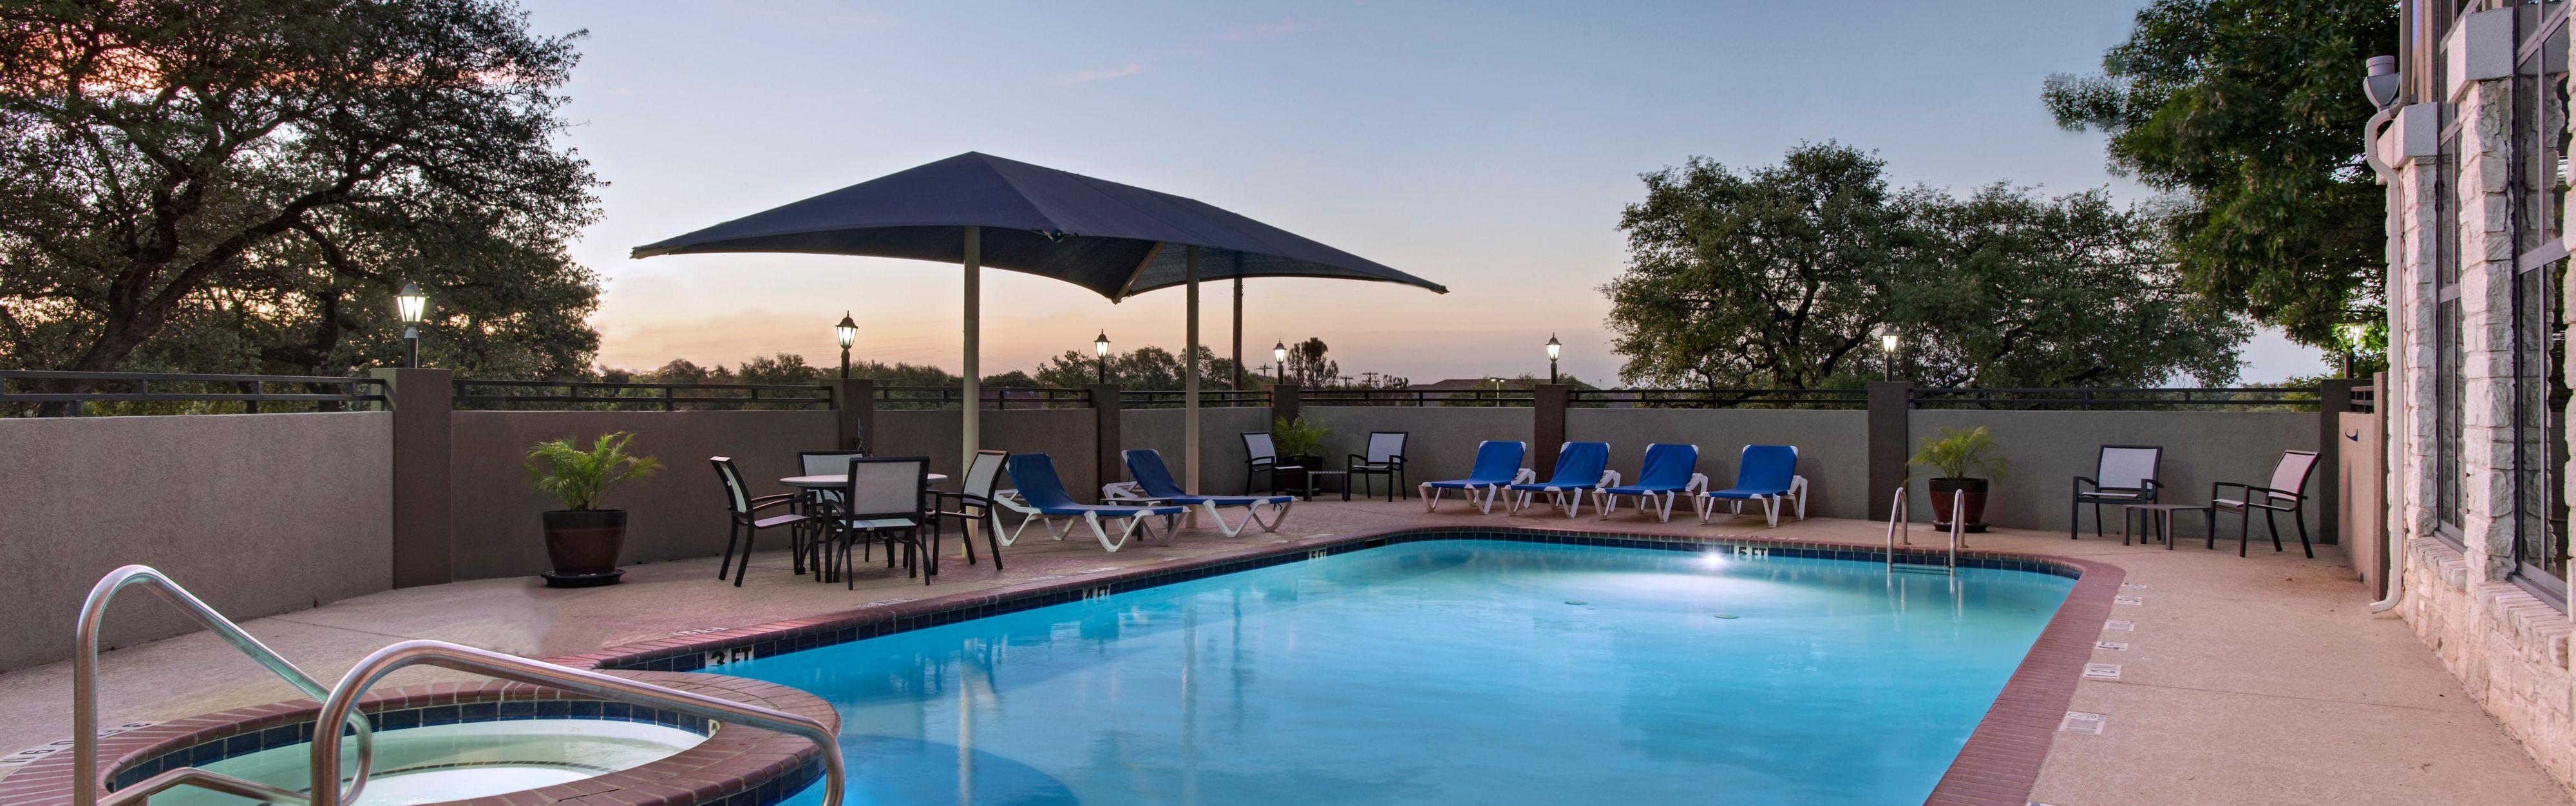 Holiday Inn Express & Suites Cedar Park (Nw Austin) image 2